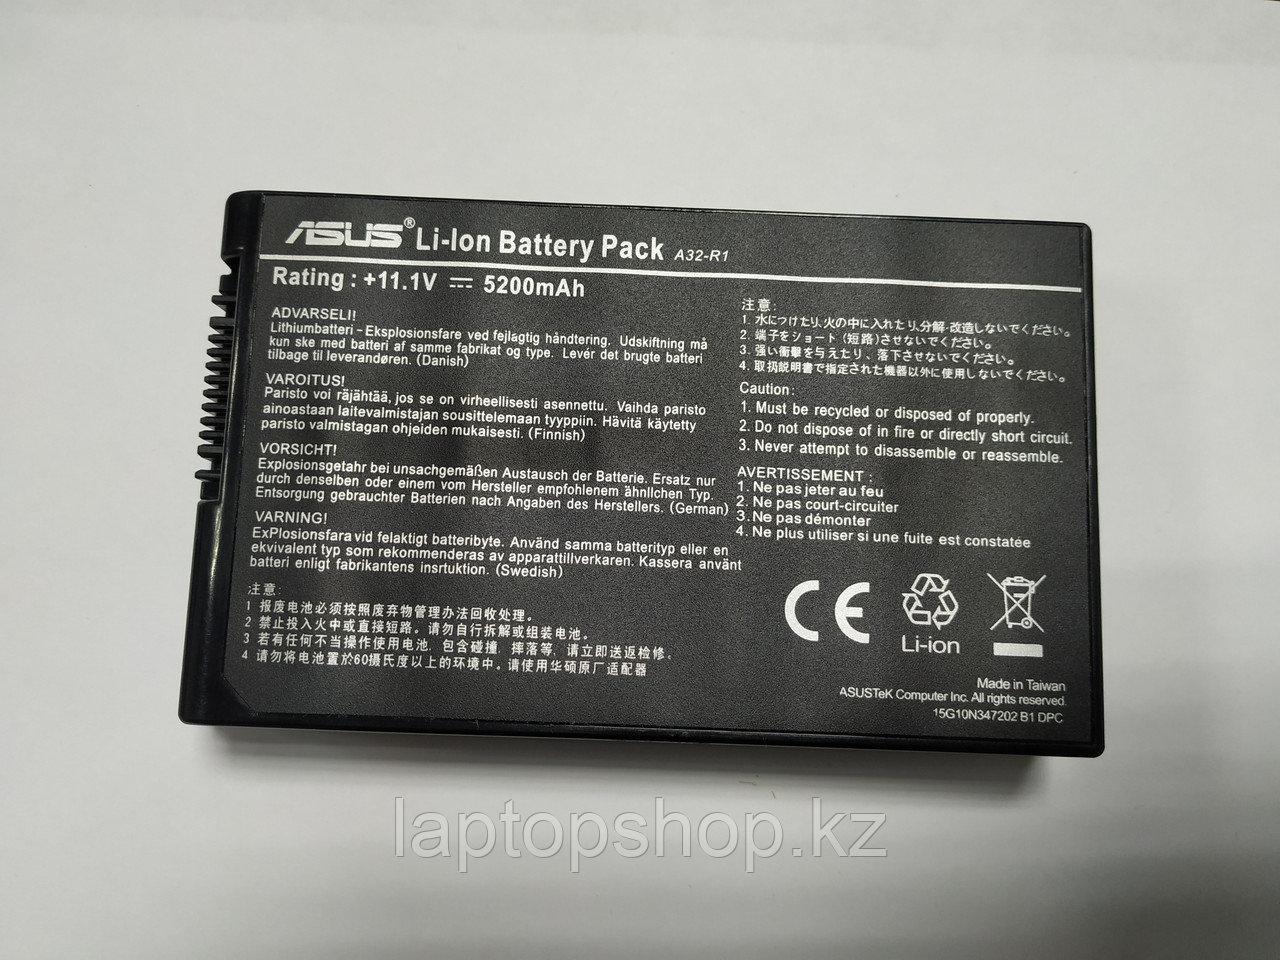 Батарея для ноутбука Original Battery for Asus A32-R1